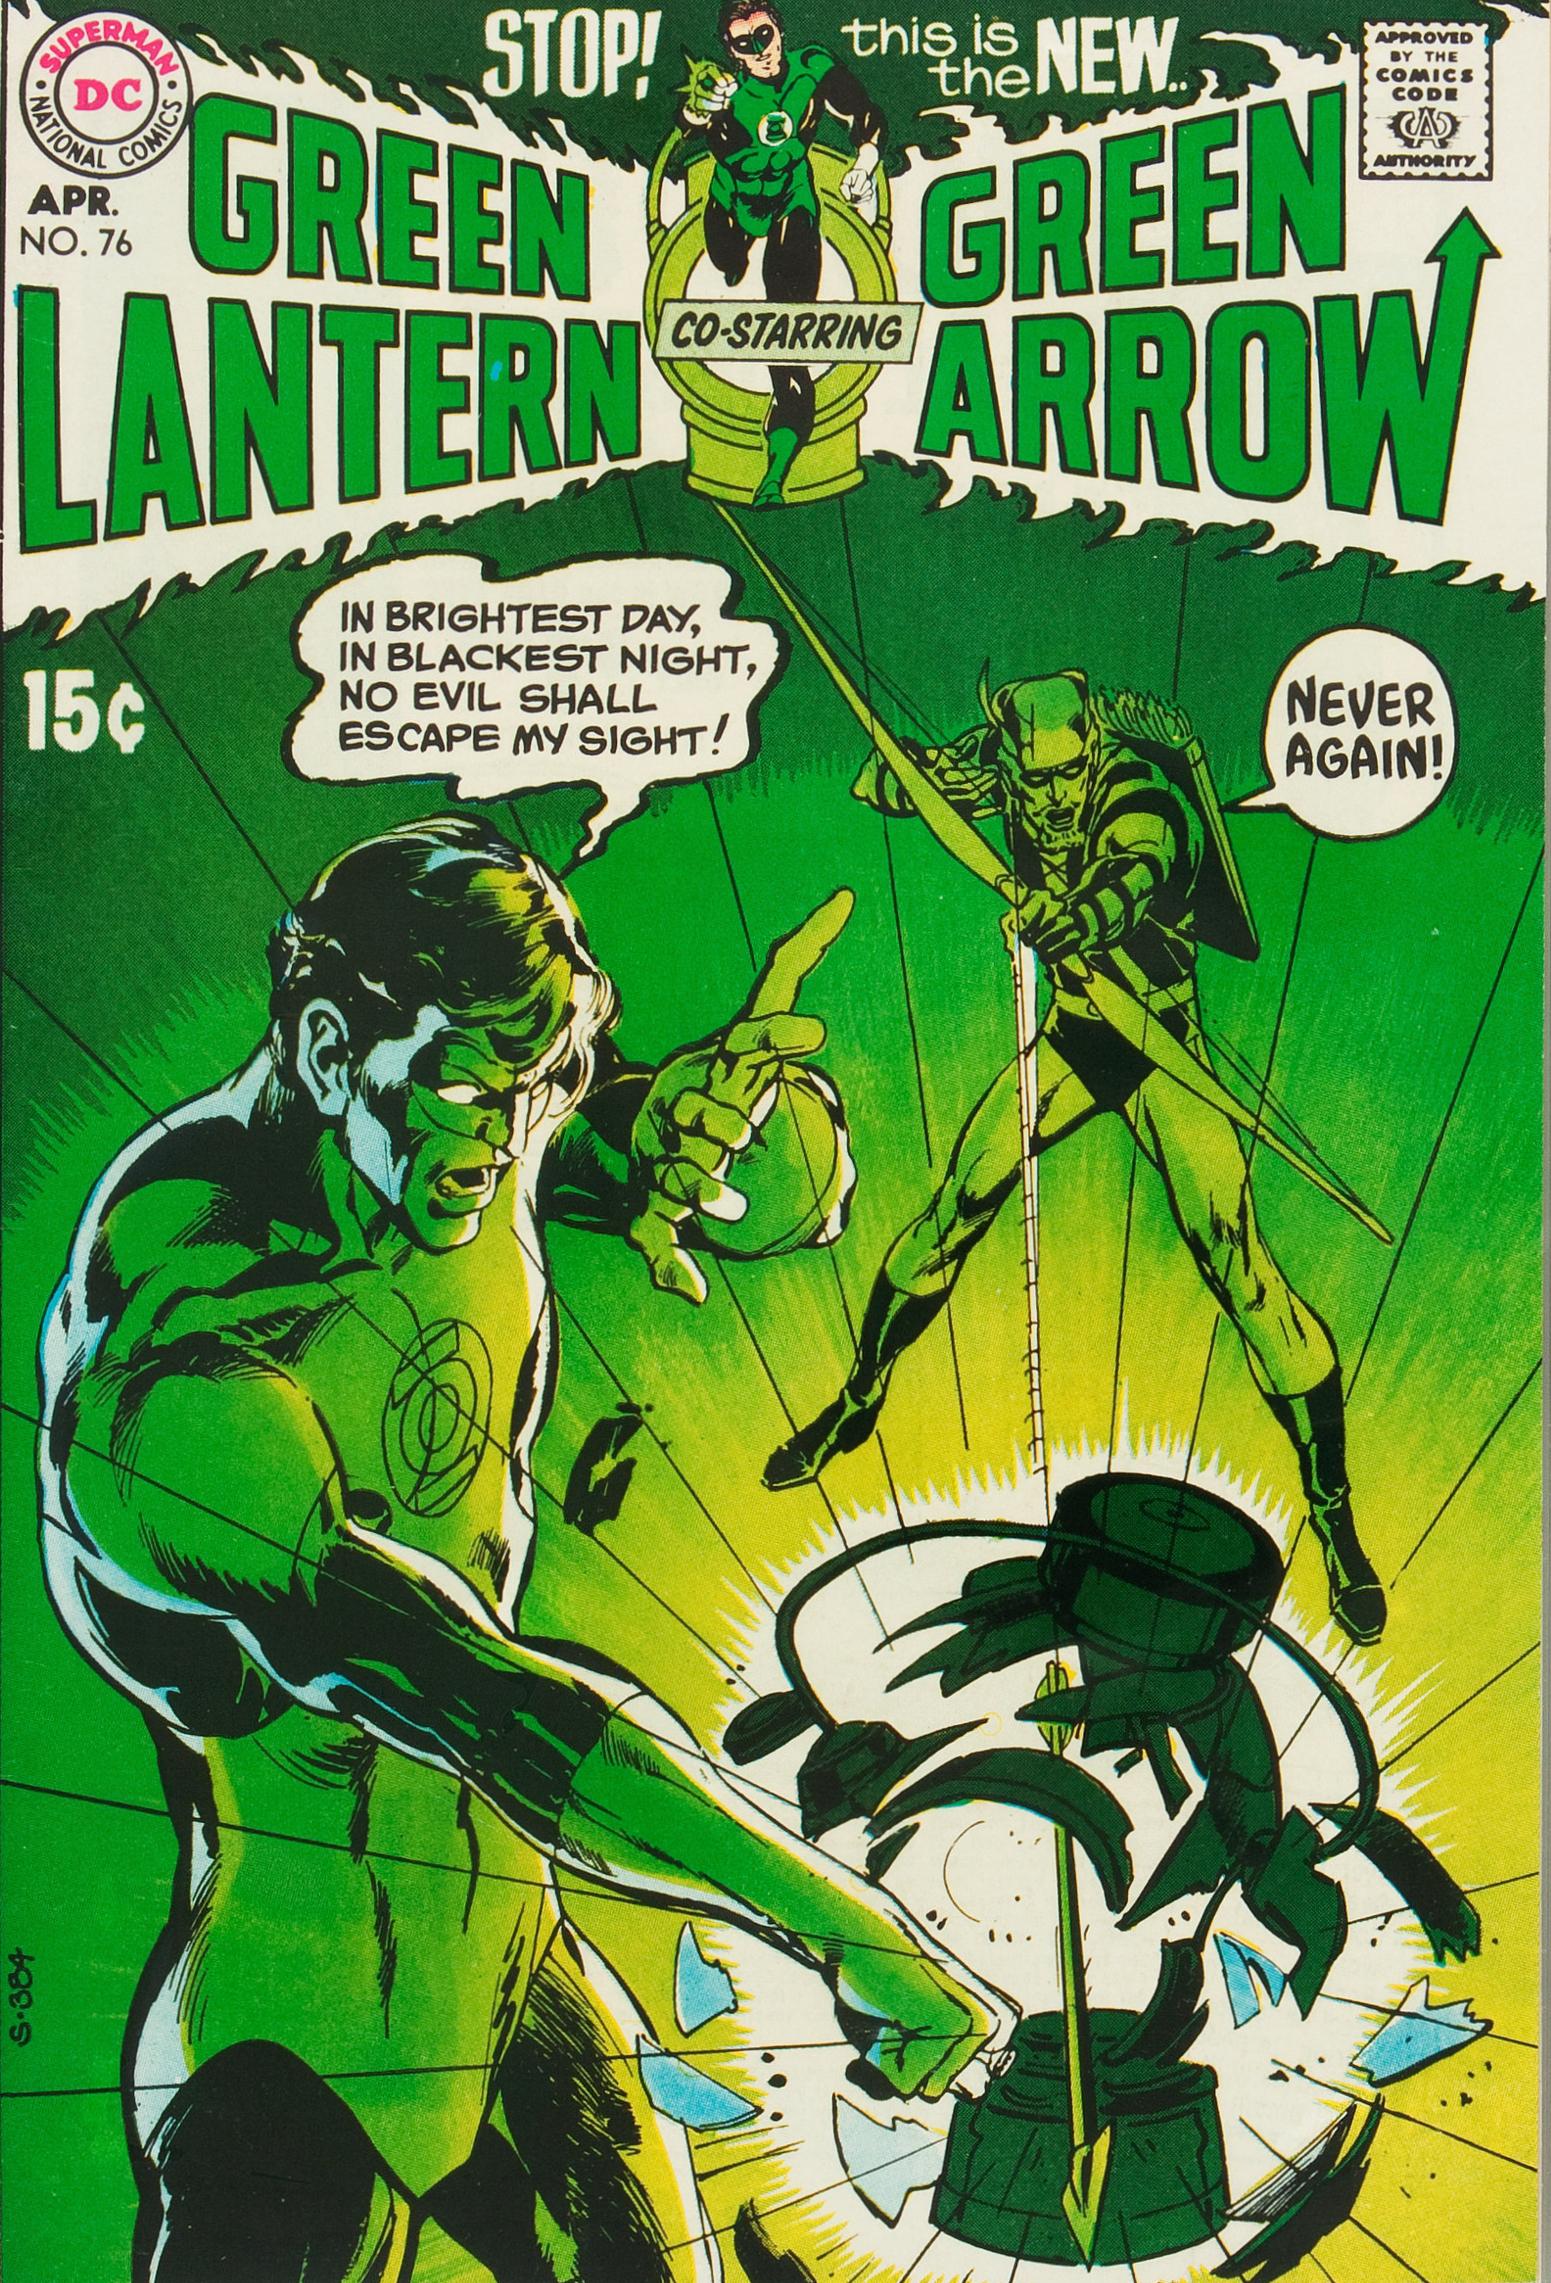 Image result for green lantern 76